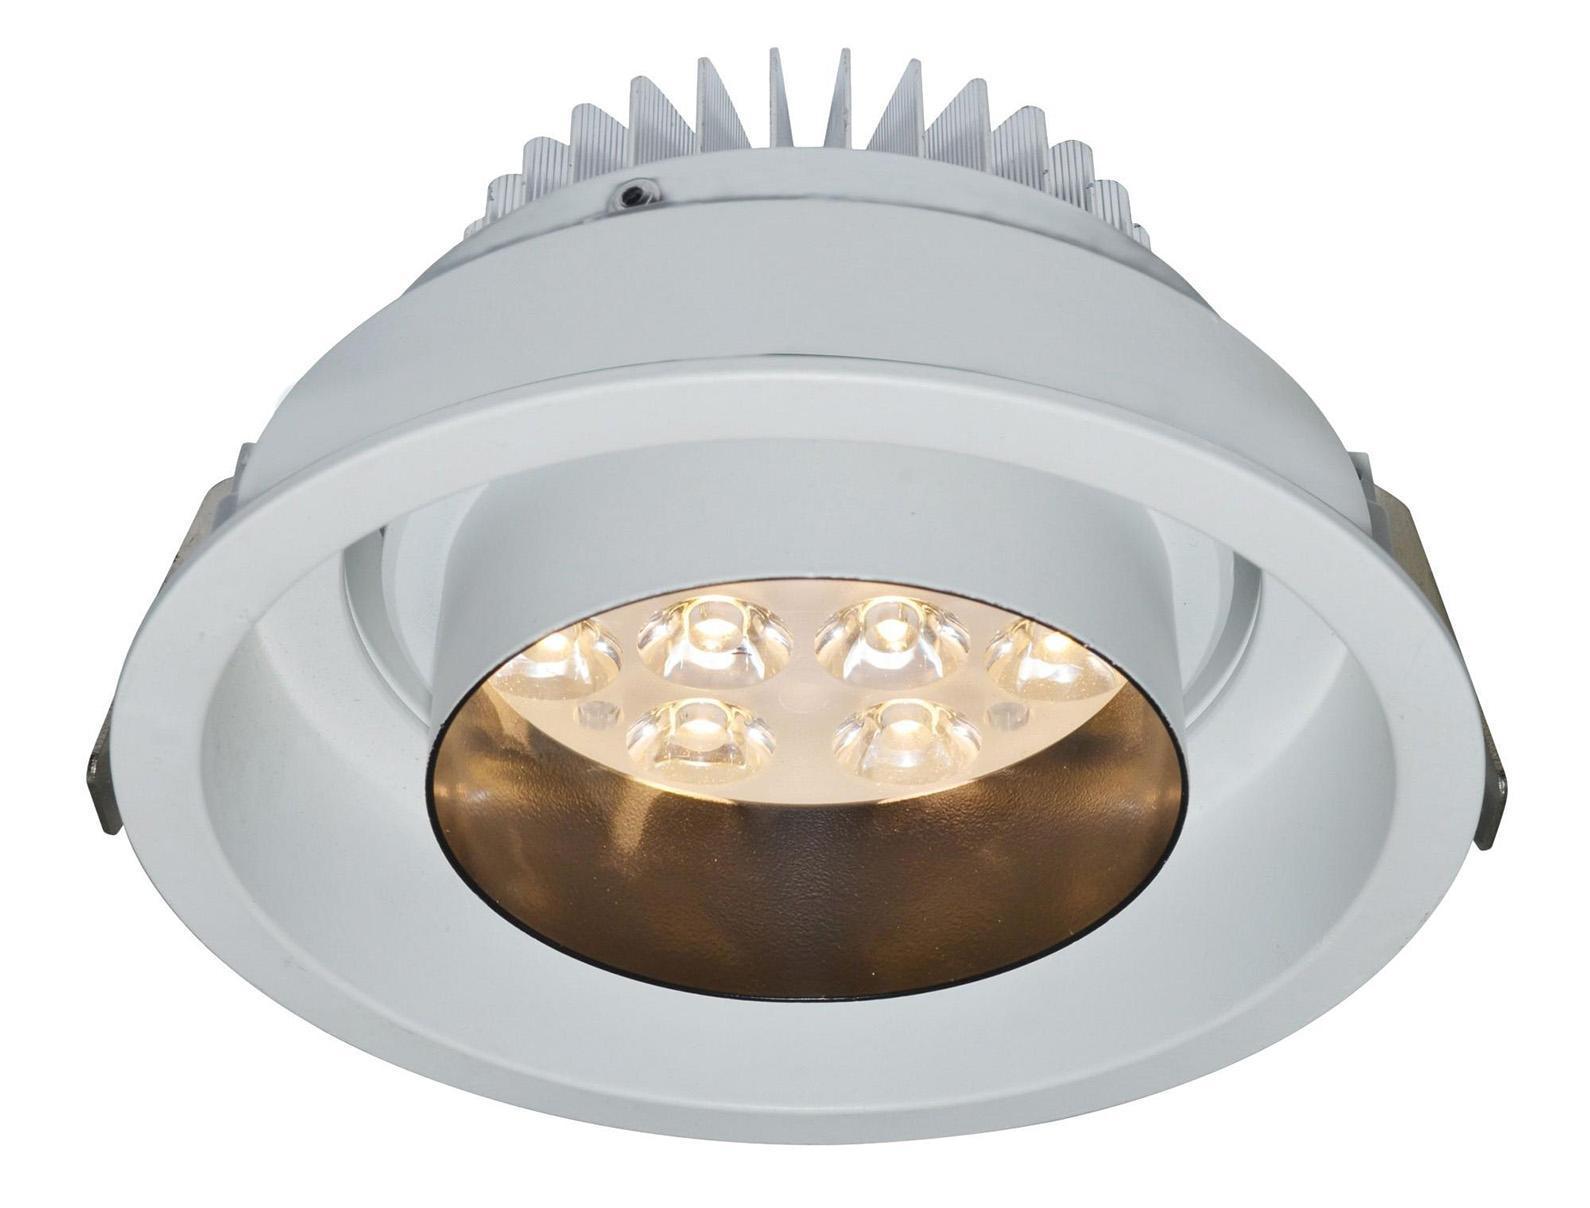 A2012PL-1WH MISSILE Встраиваемый светильникA2012PL-1WH12W LED; 840 lm Материал: Арматура: АлюминийРазмер: 152x152x85Цвет: Белый